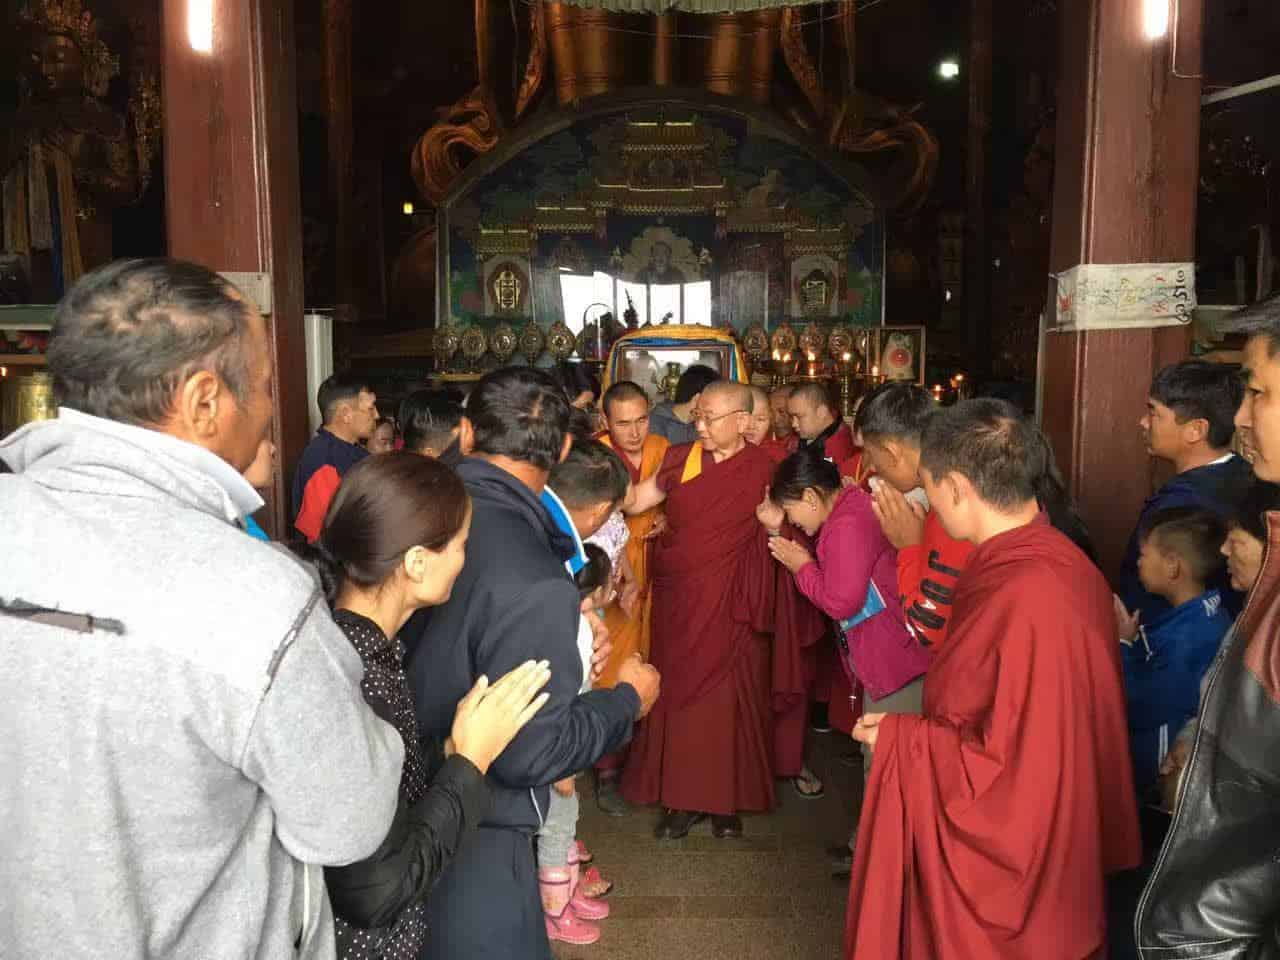 gosok-rinpoche-mongolia-2016-ce398d69334faade2b100855007b92e